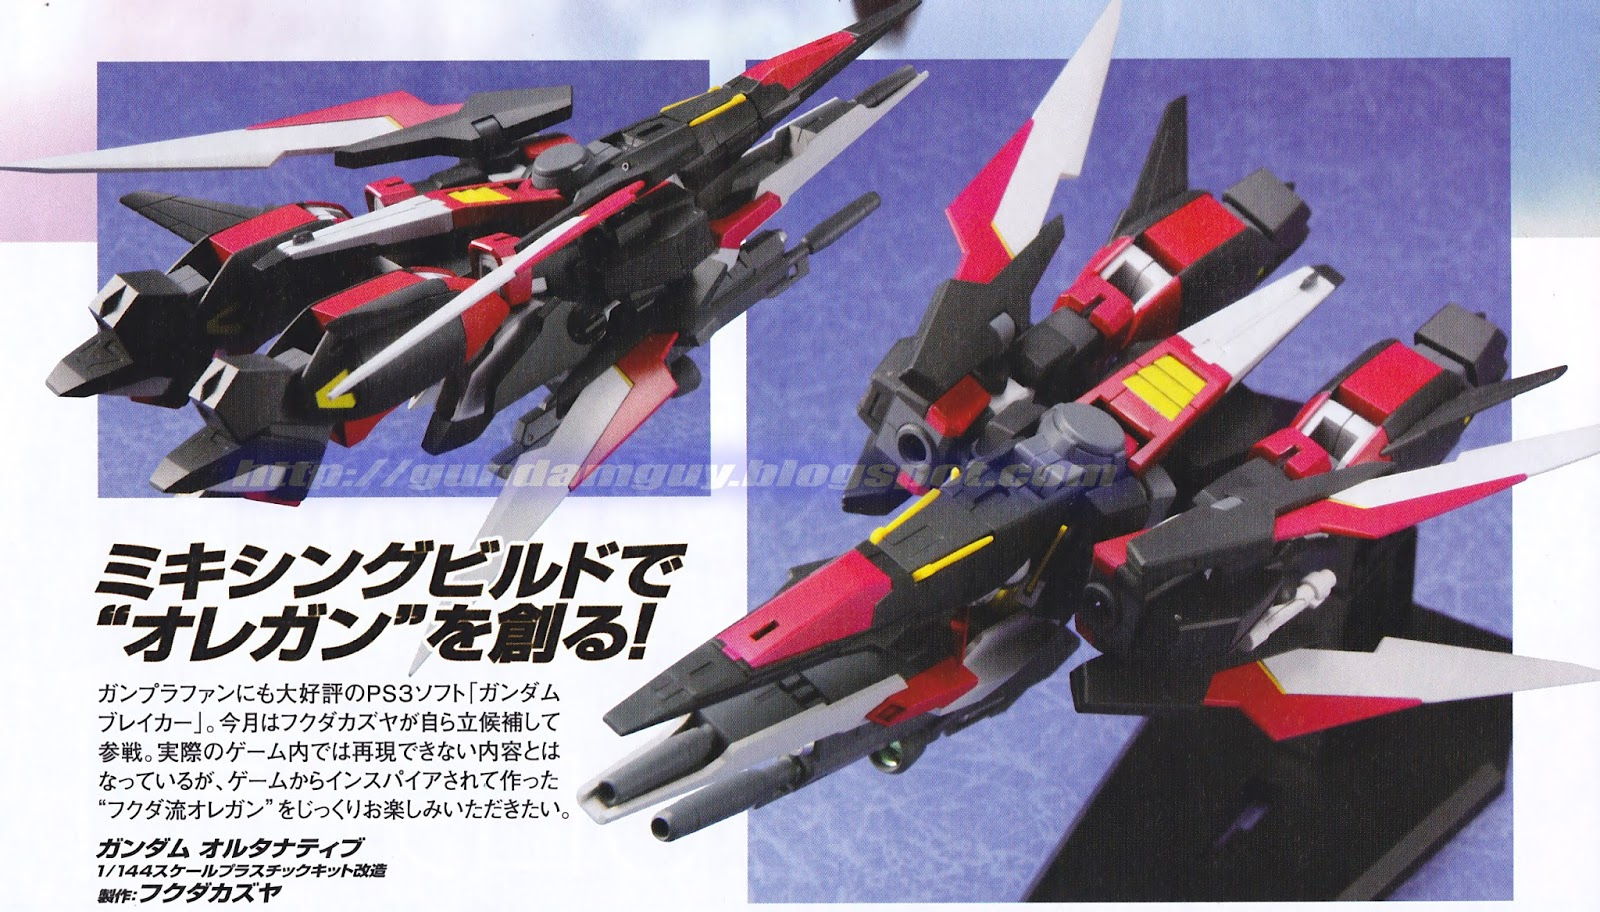 GUNDAM GUY: 1/144 Gundam Alternative [Gundam Breaker] - Custom Build